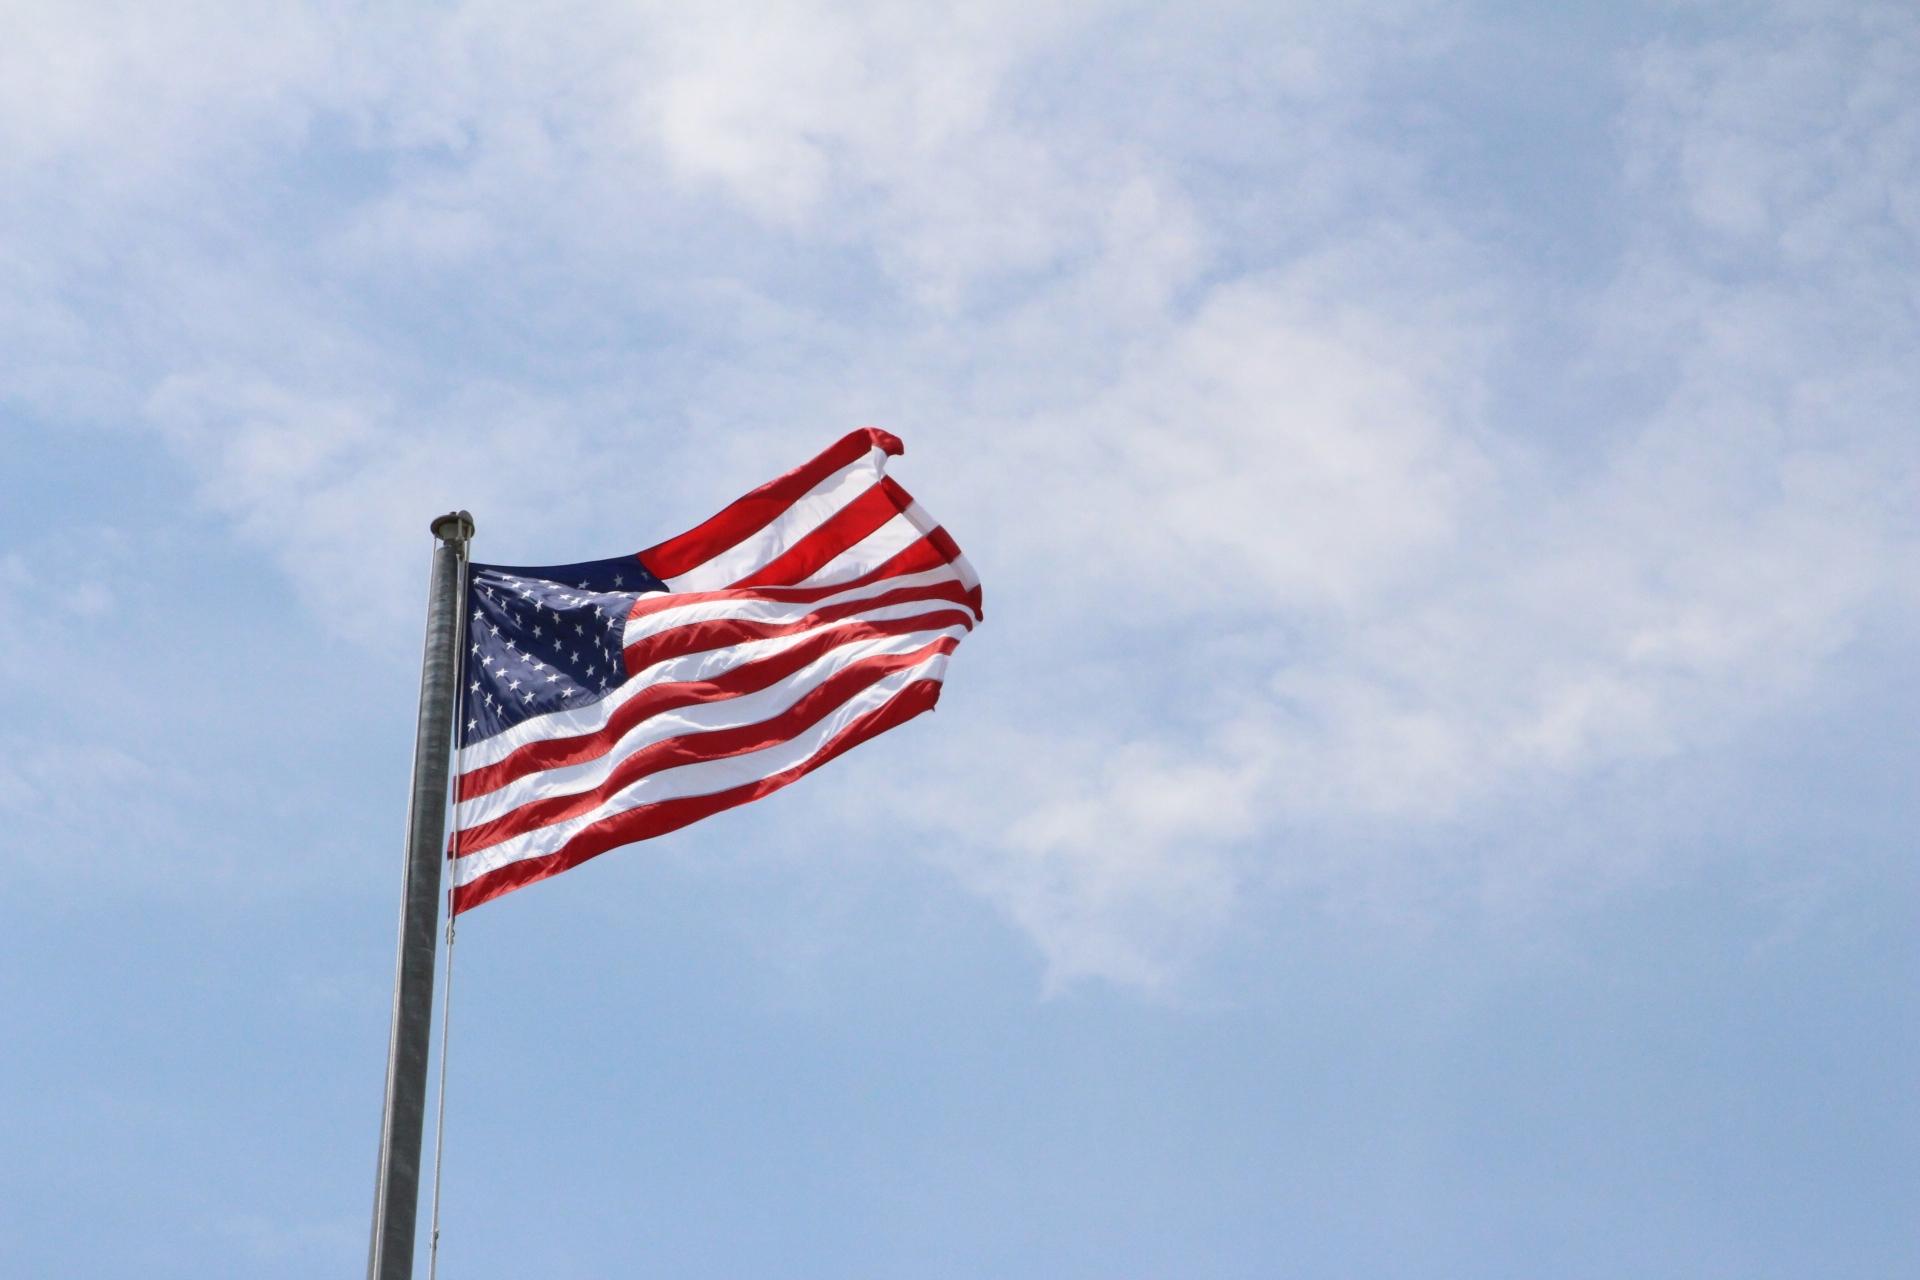 American flag at Montauk